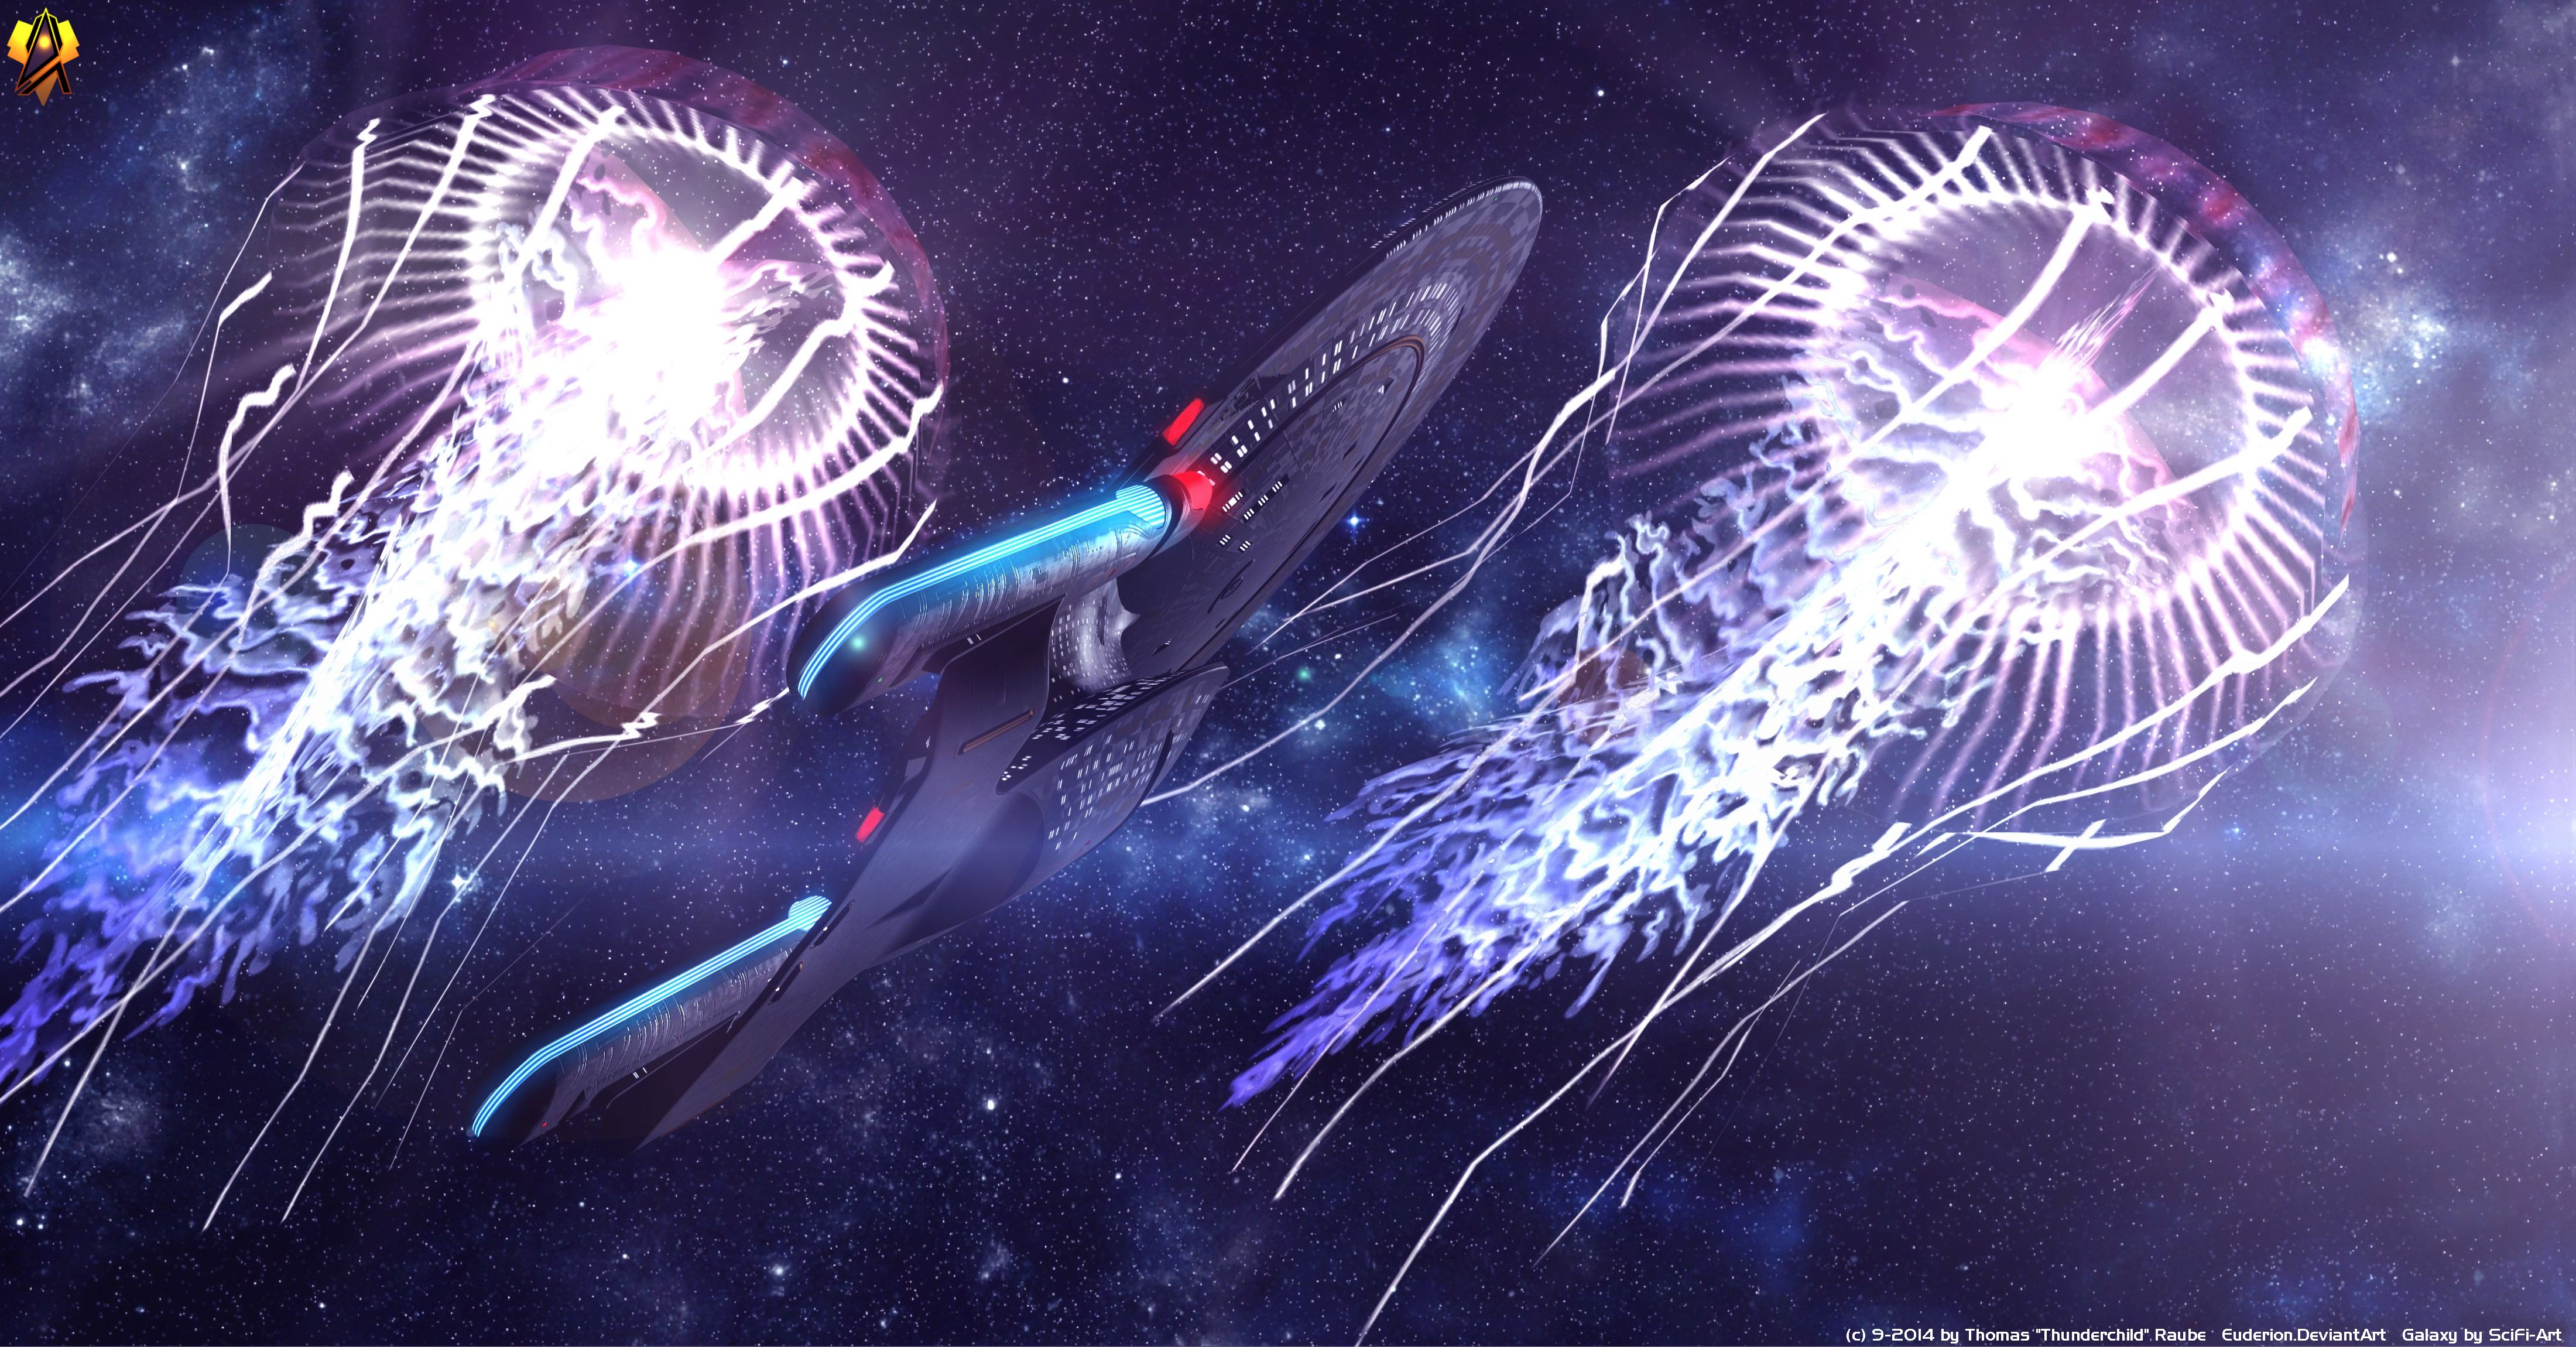 Dancing between the Stars - 27 Years Star Trek TNG